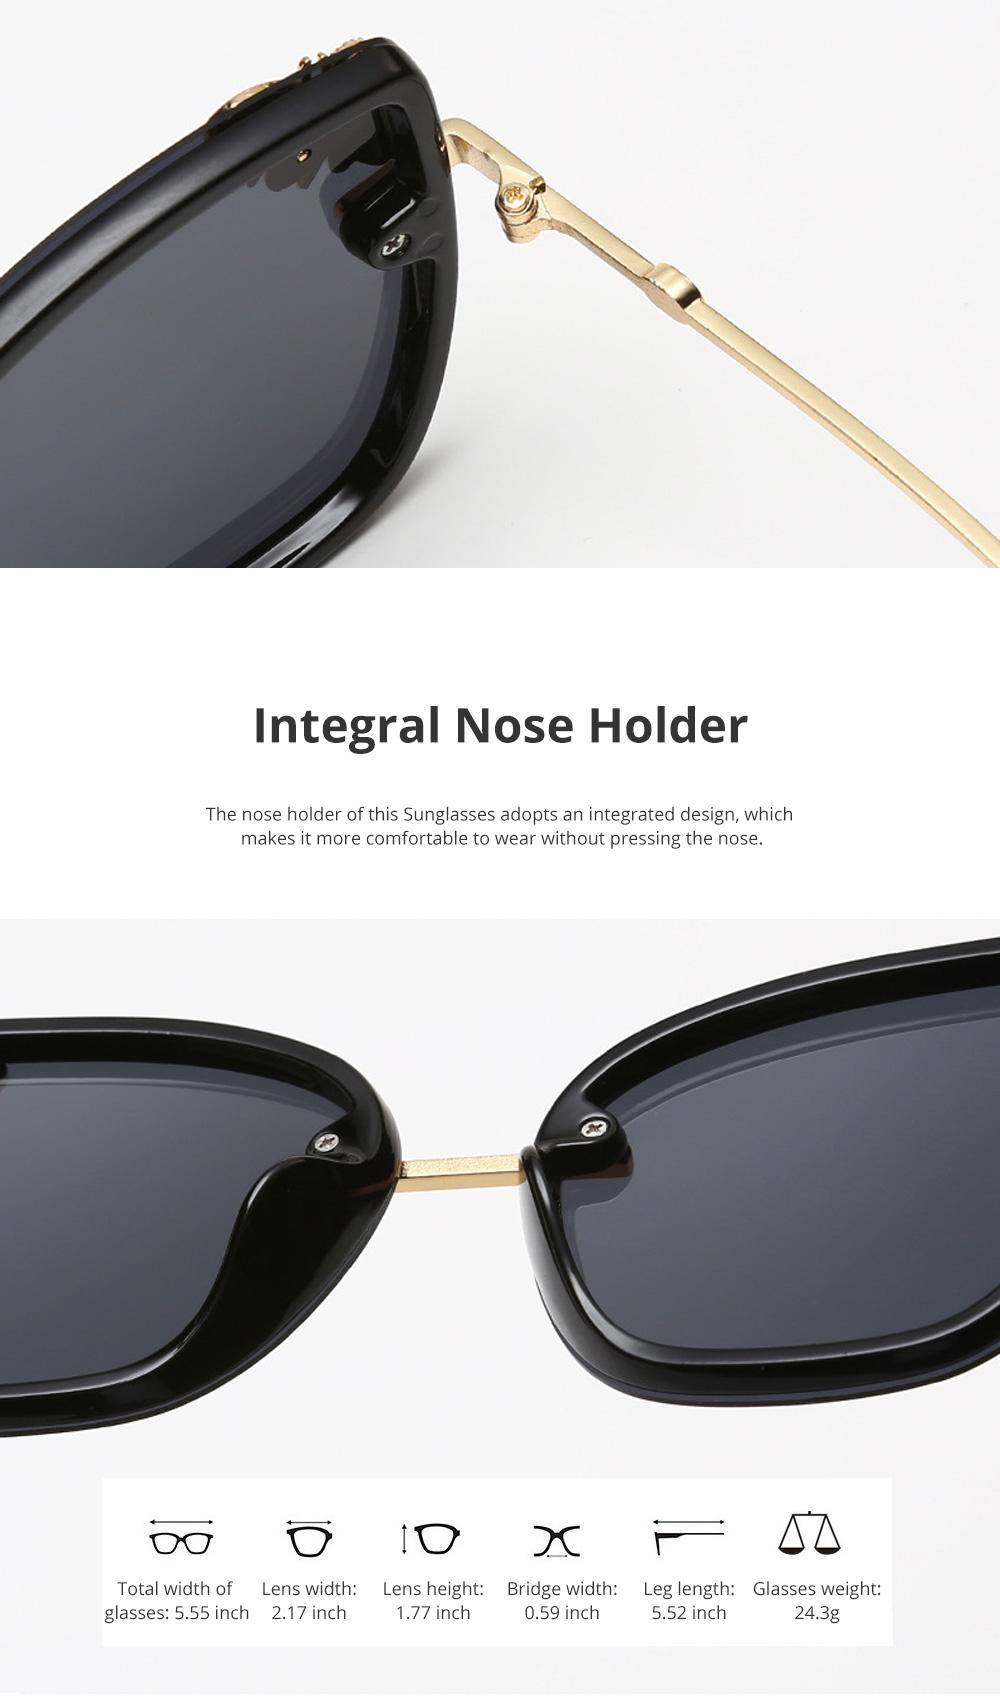 2020 New Fashionable Polarized Glasses Sunglasses for Women's Drivers Gradient Sunglasses 4